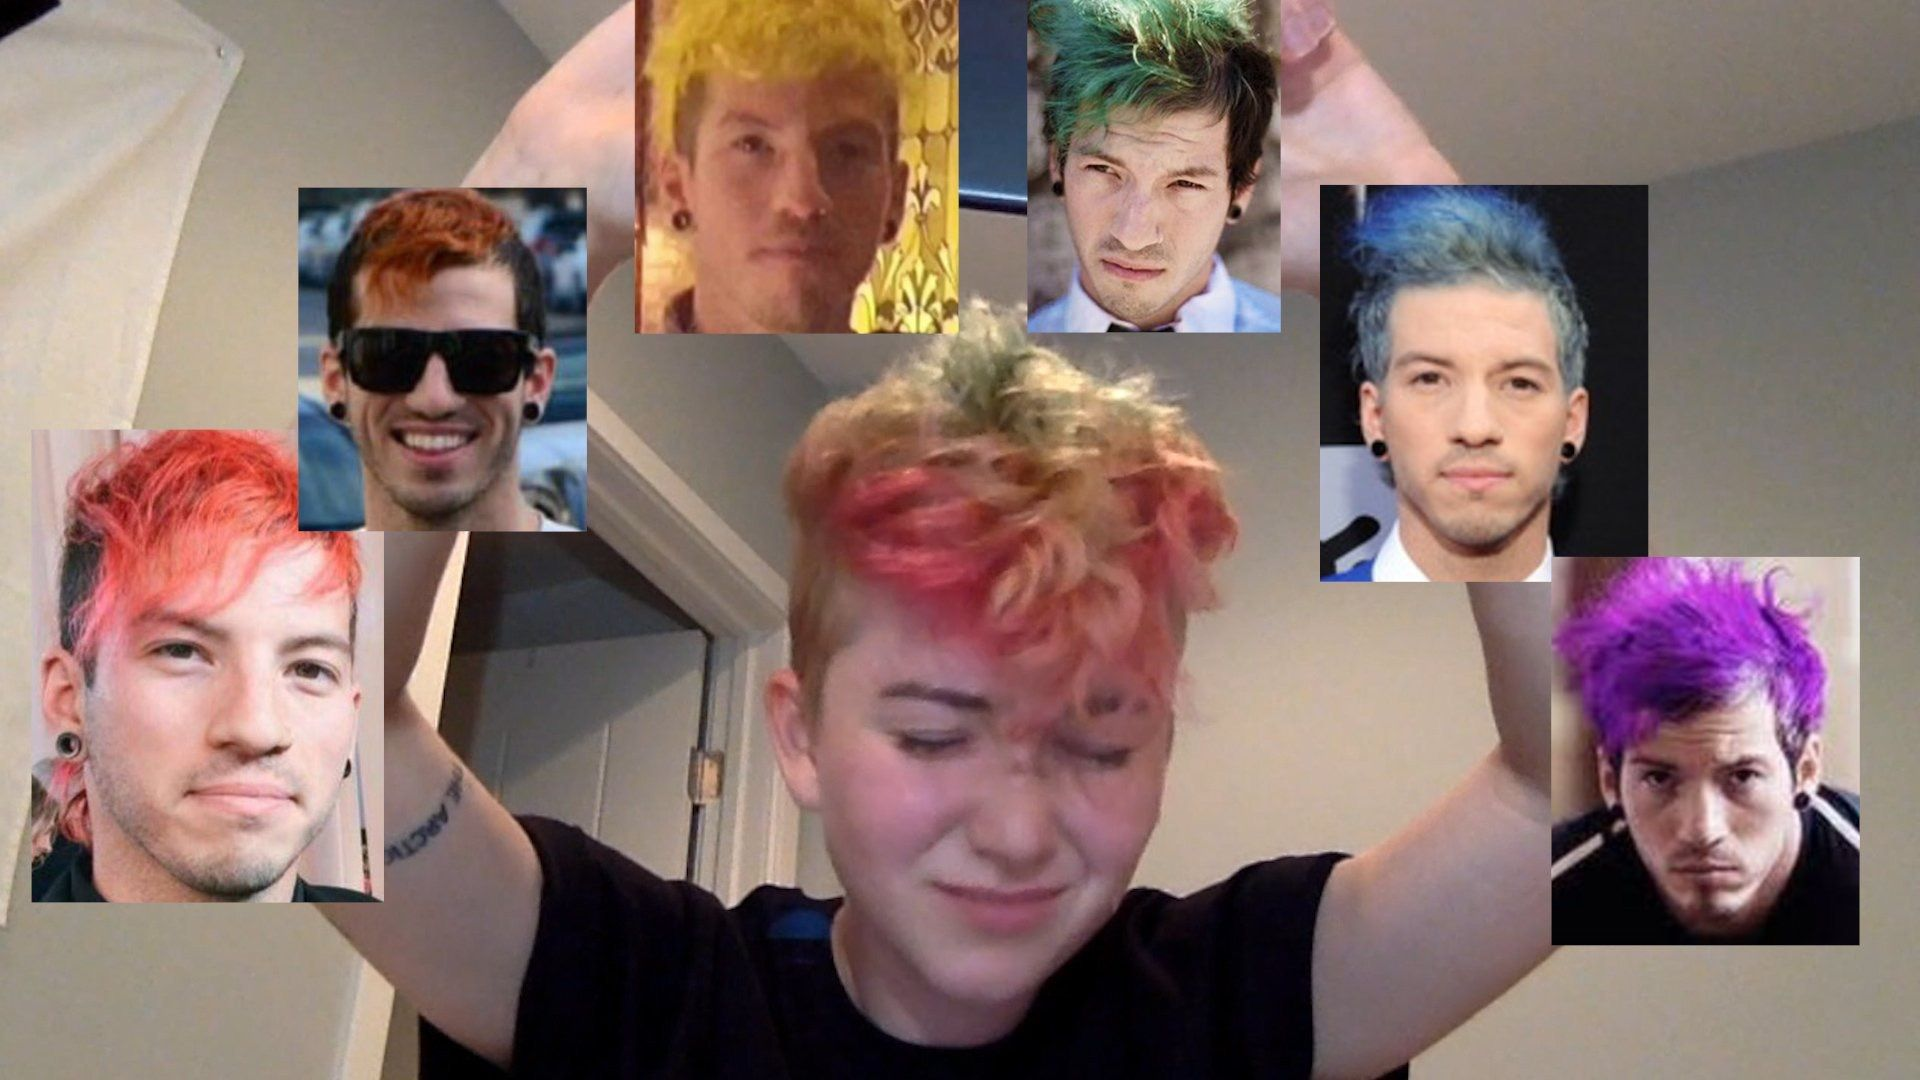 Emo boy hairstyle hd wallpaper yes my two favorite things  twenty øne piløts  pinterest